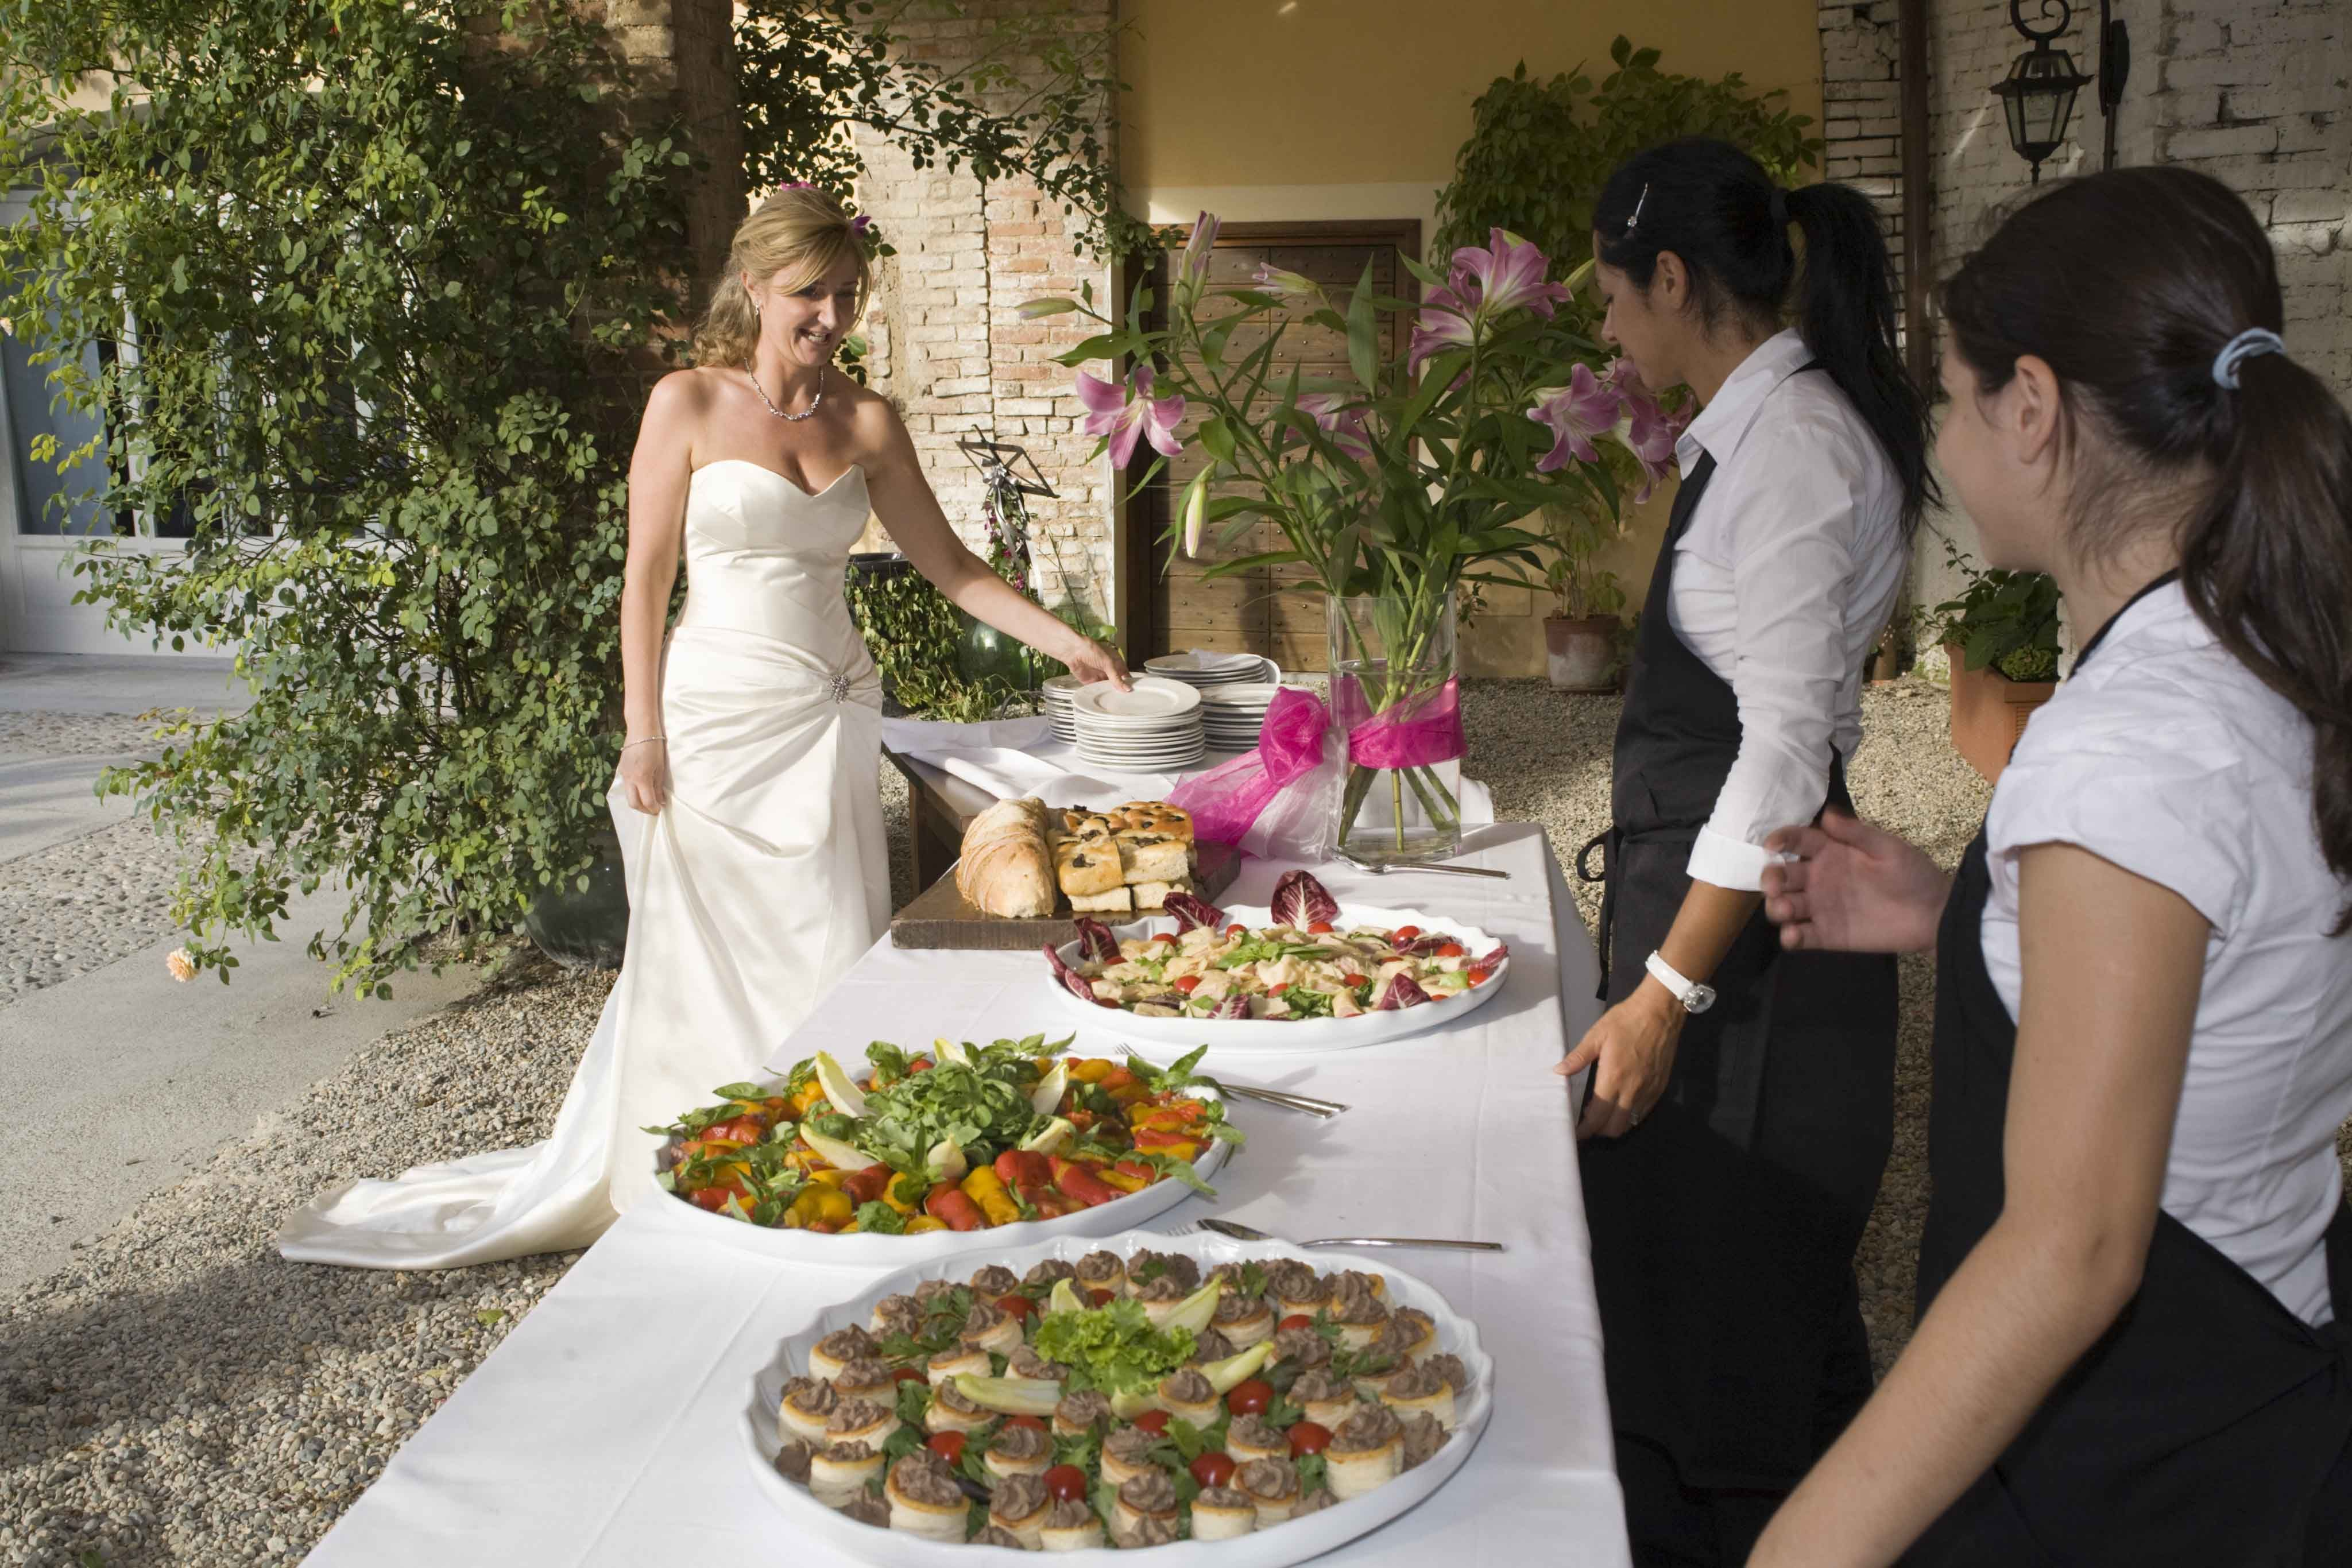 Summer Wedding Buffet Menu Ideas: La Villa Hotel Weddings, Wedding Food Buffet, Italian